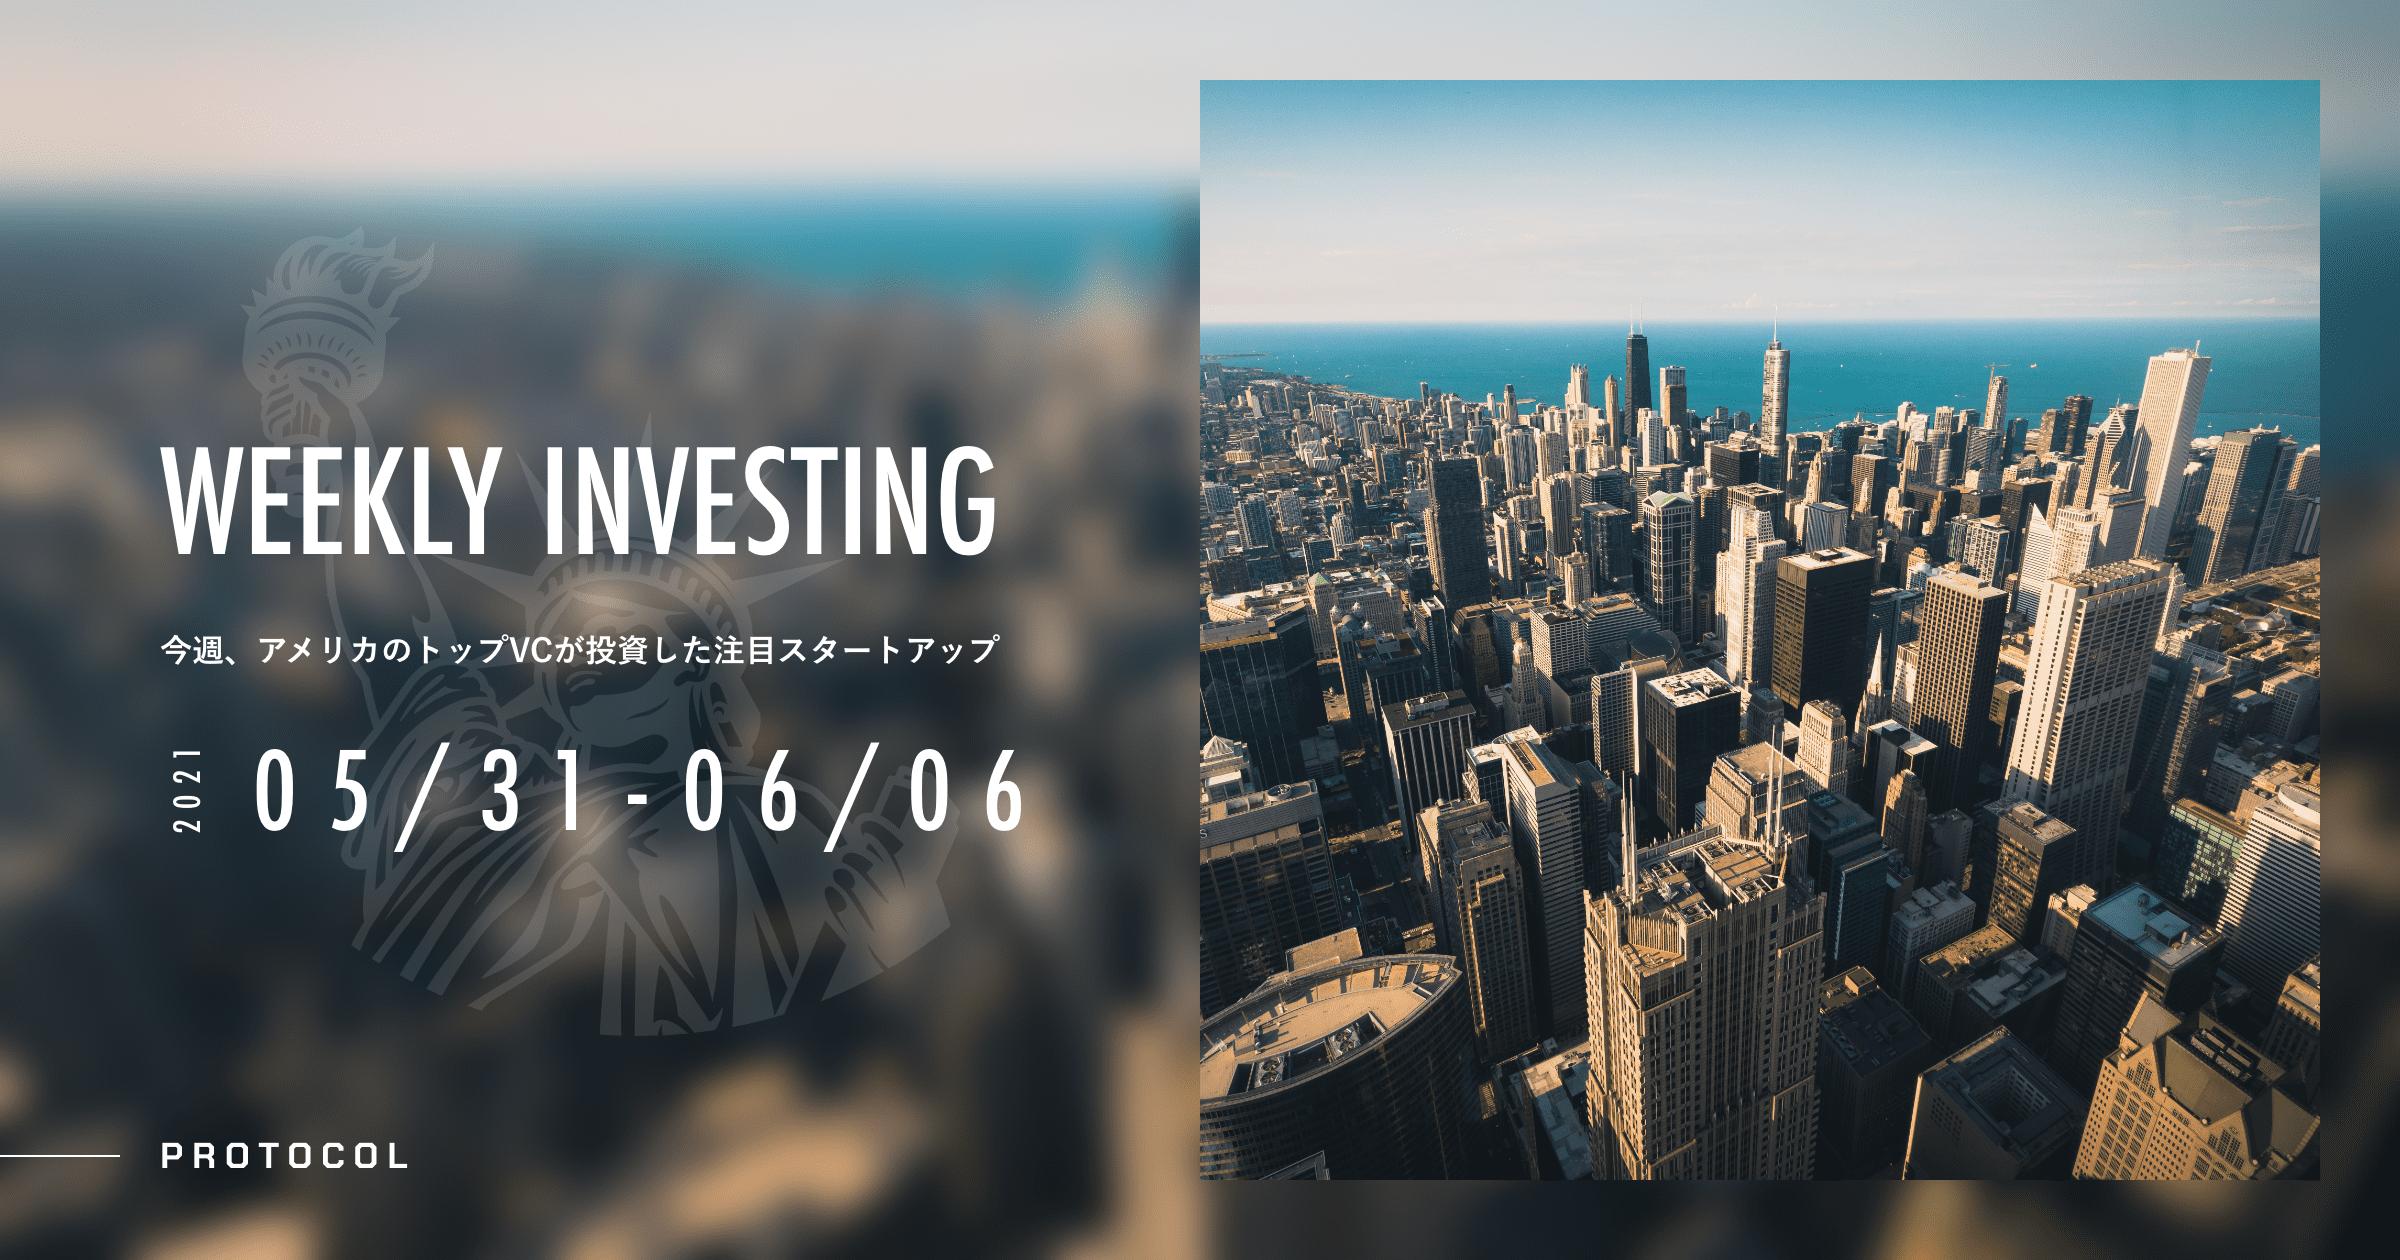 【Weekly Investing】アメリカのトップVCが投資した注目スタートアップ──2021年5月31日-6月6日